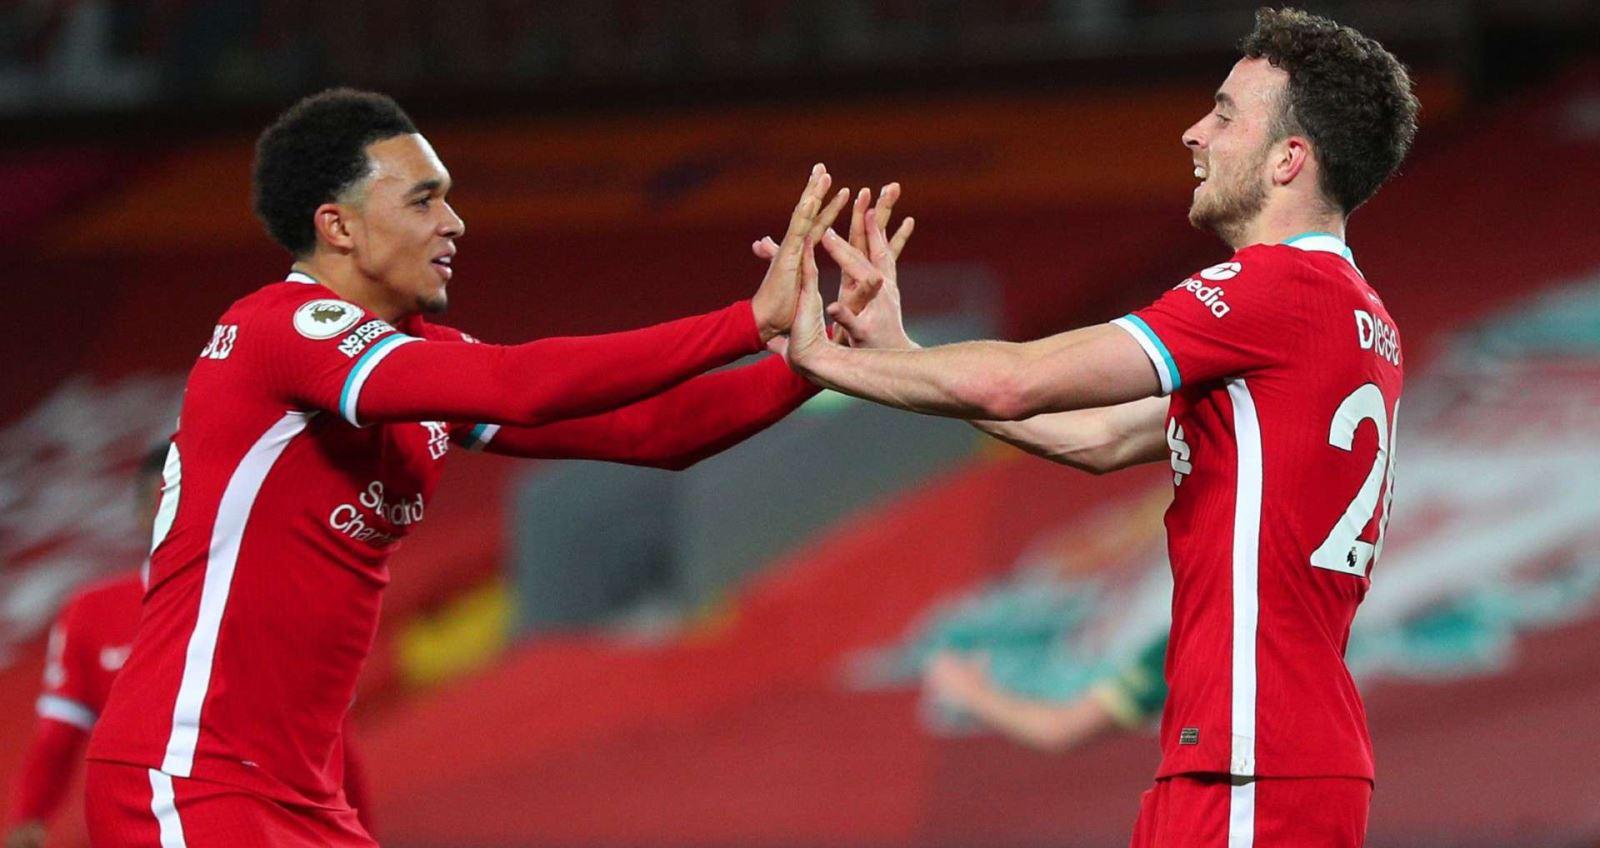 Trent Alexander-Arnold, ket qua bong da, Liverpool 2-0 Midtjylland, kết quả bóng đá cúp C1 châu Âu, kết quả Liverpool vs Midtjylland, kết quả Liverpool, kết quả Champions League